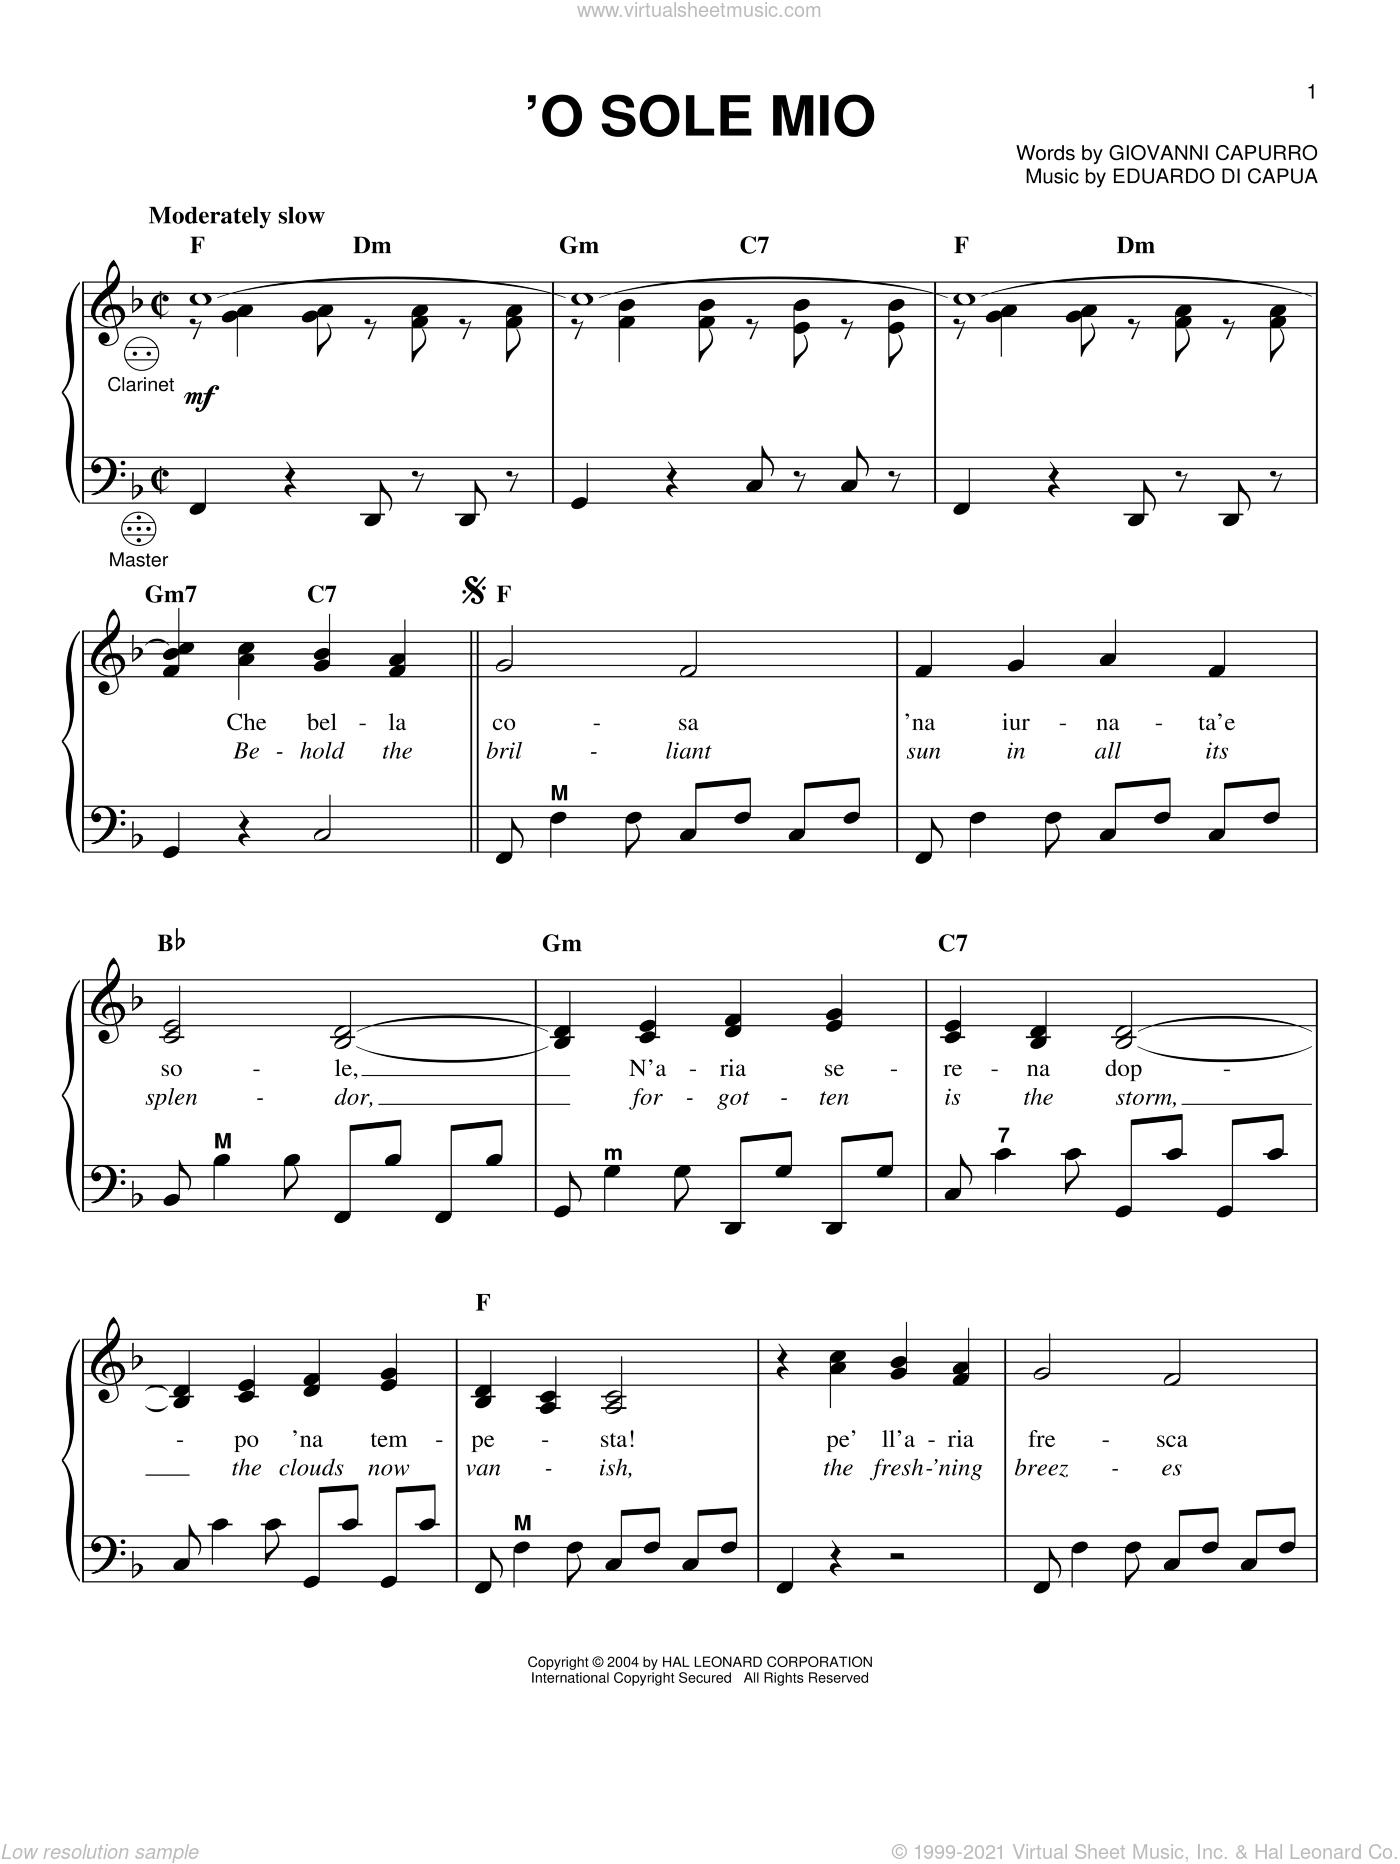 o sole mio sheet music free pdf